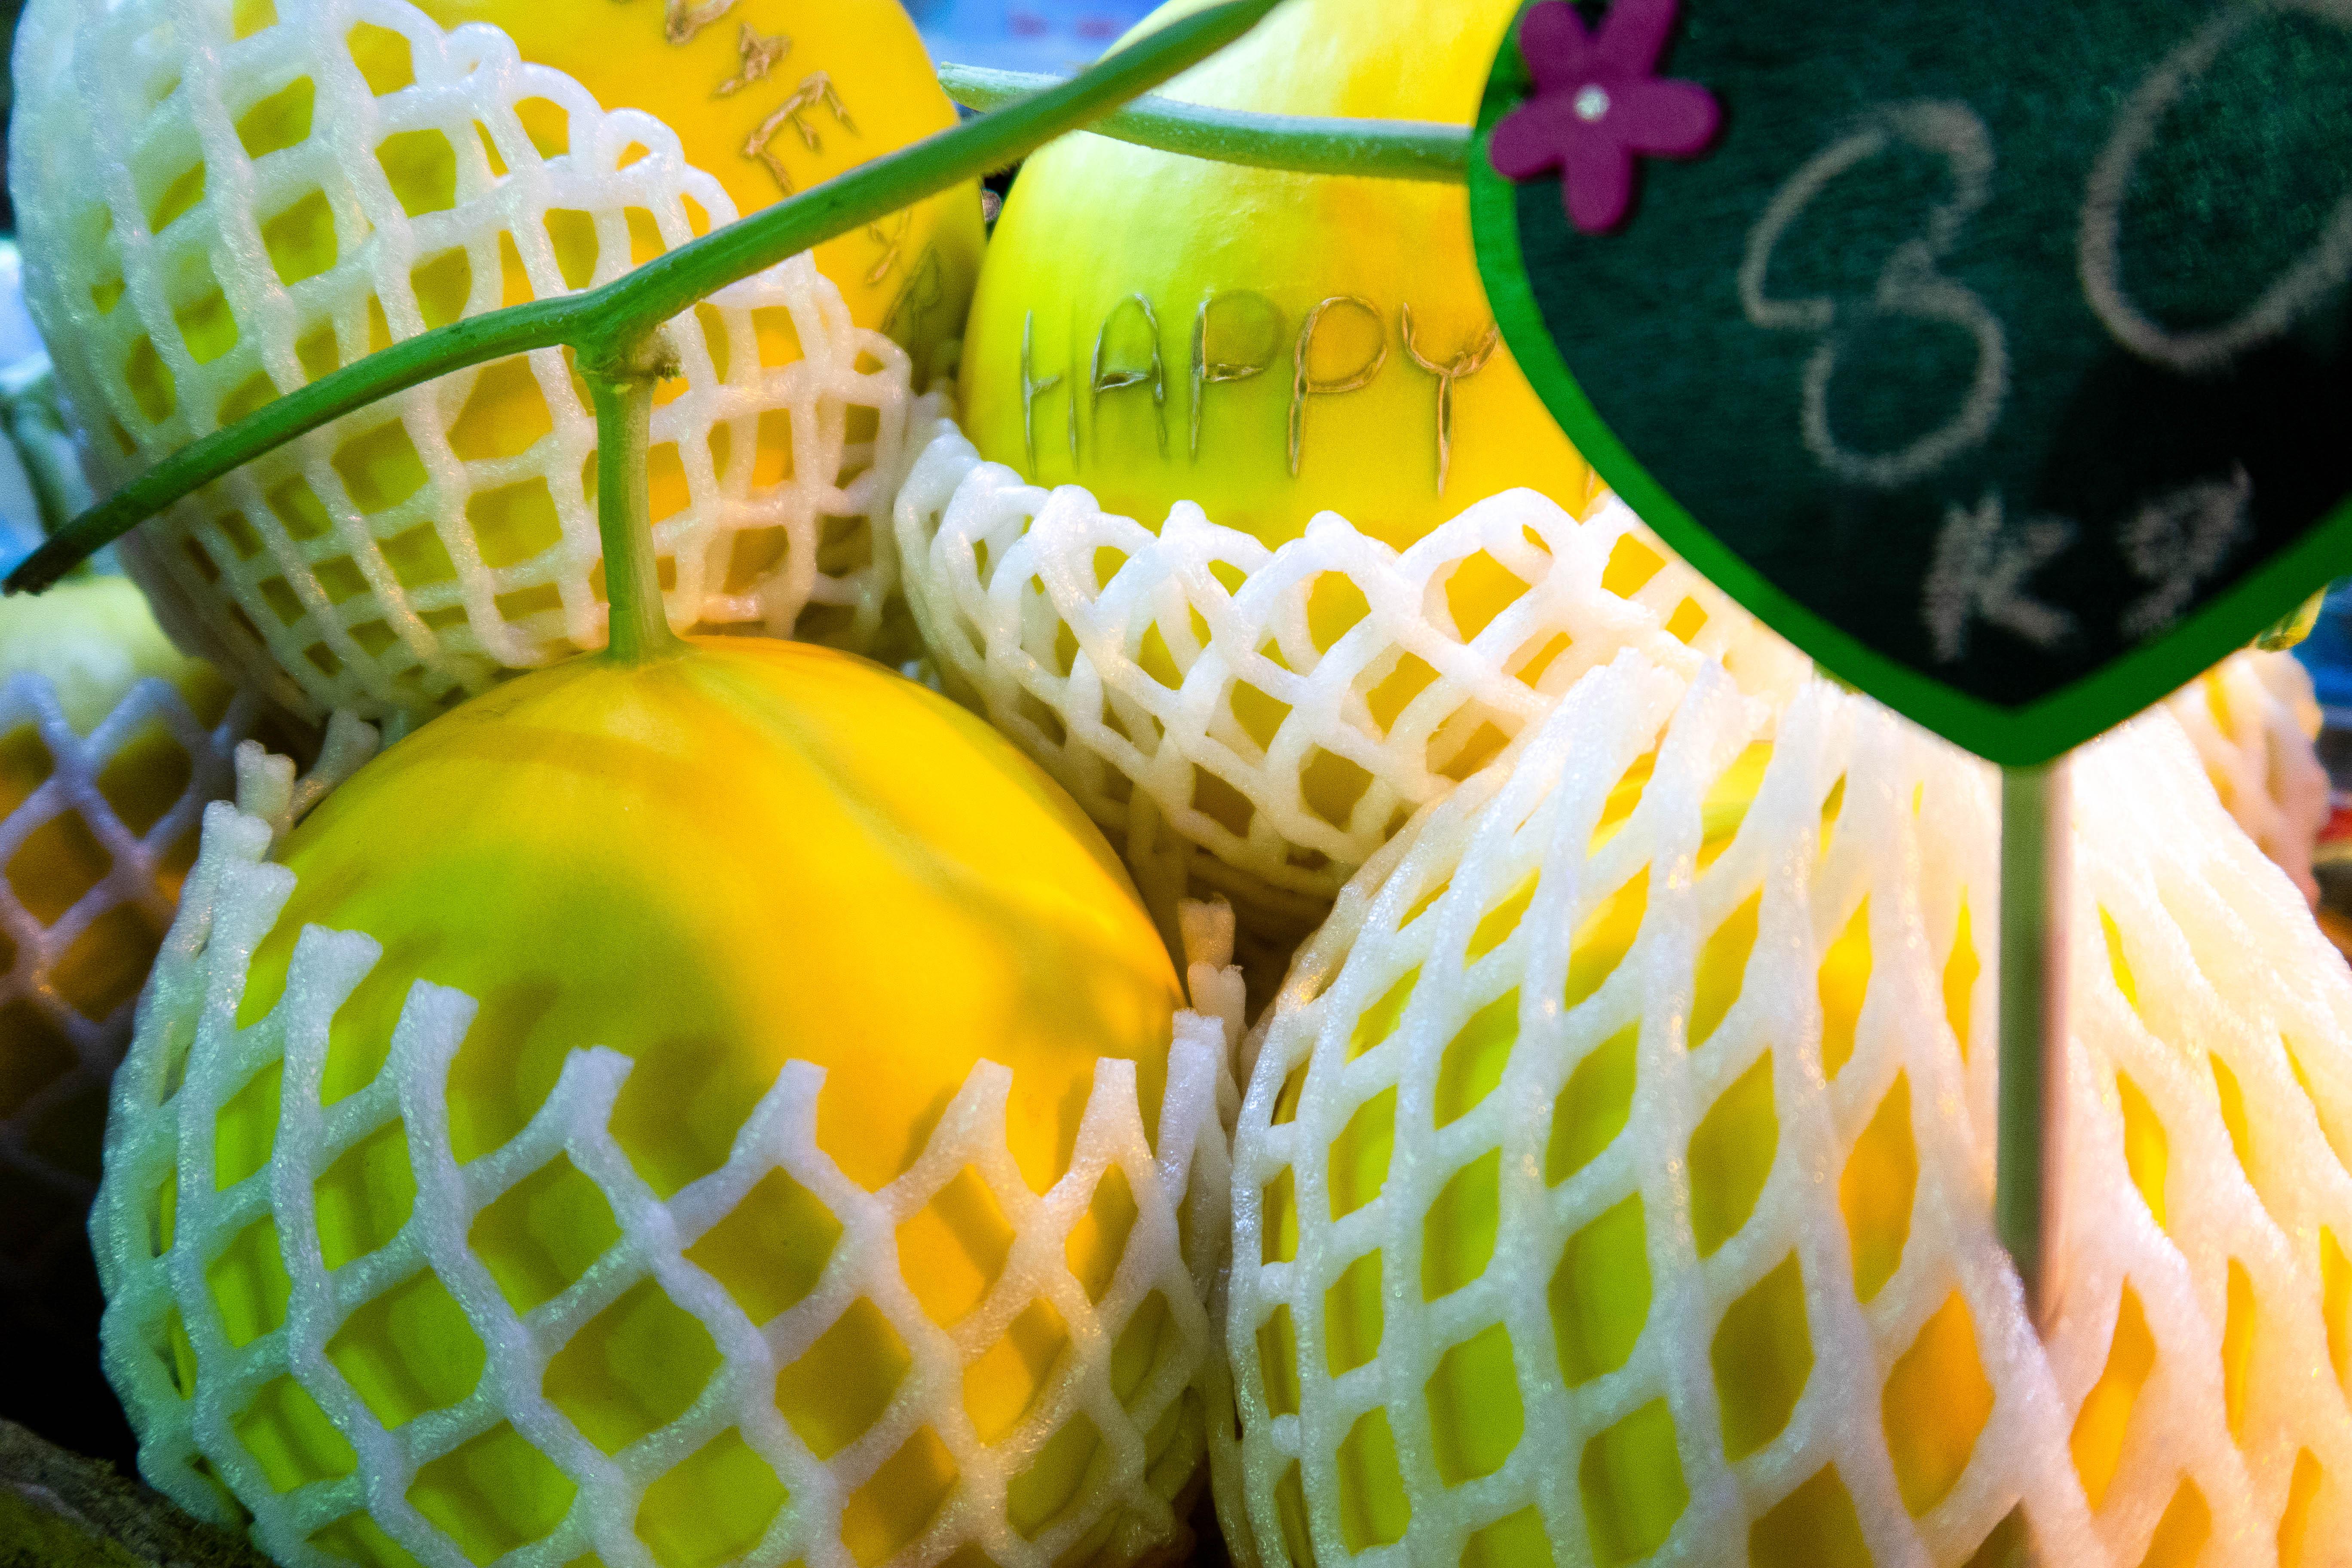 Melon - FRUITS & LÉGUMES